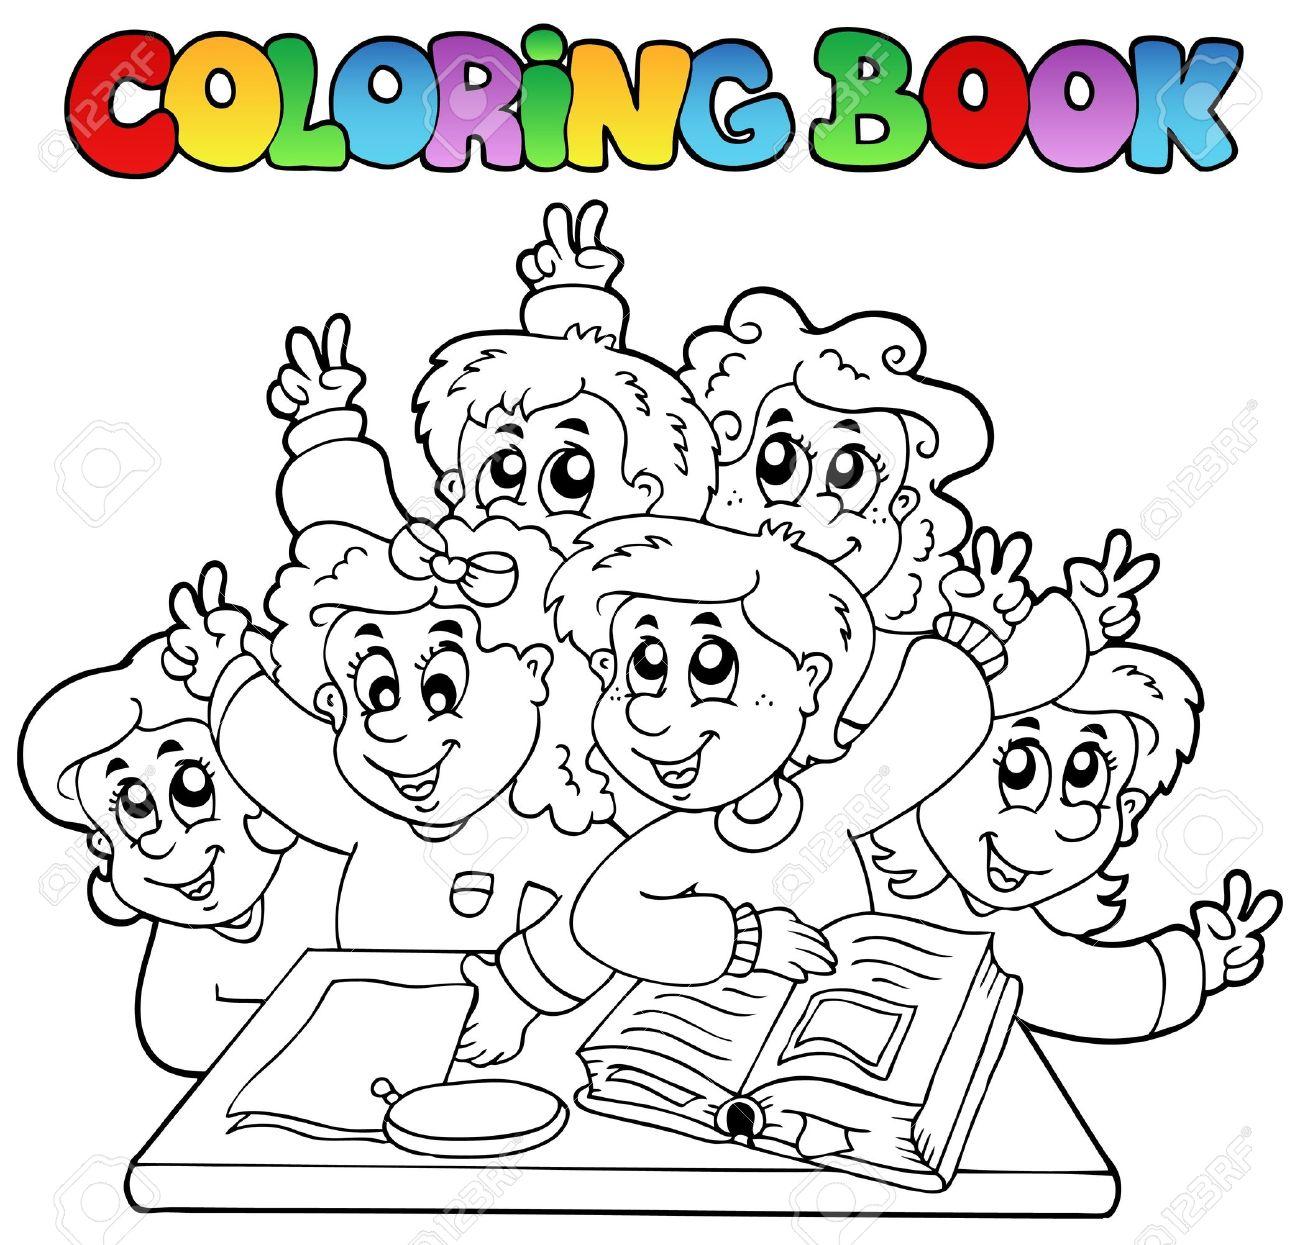 Coloring book school - Coloring Book School Cartoons Stock Vector 10354157